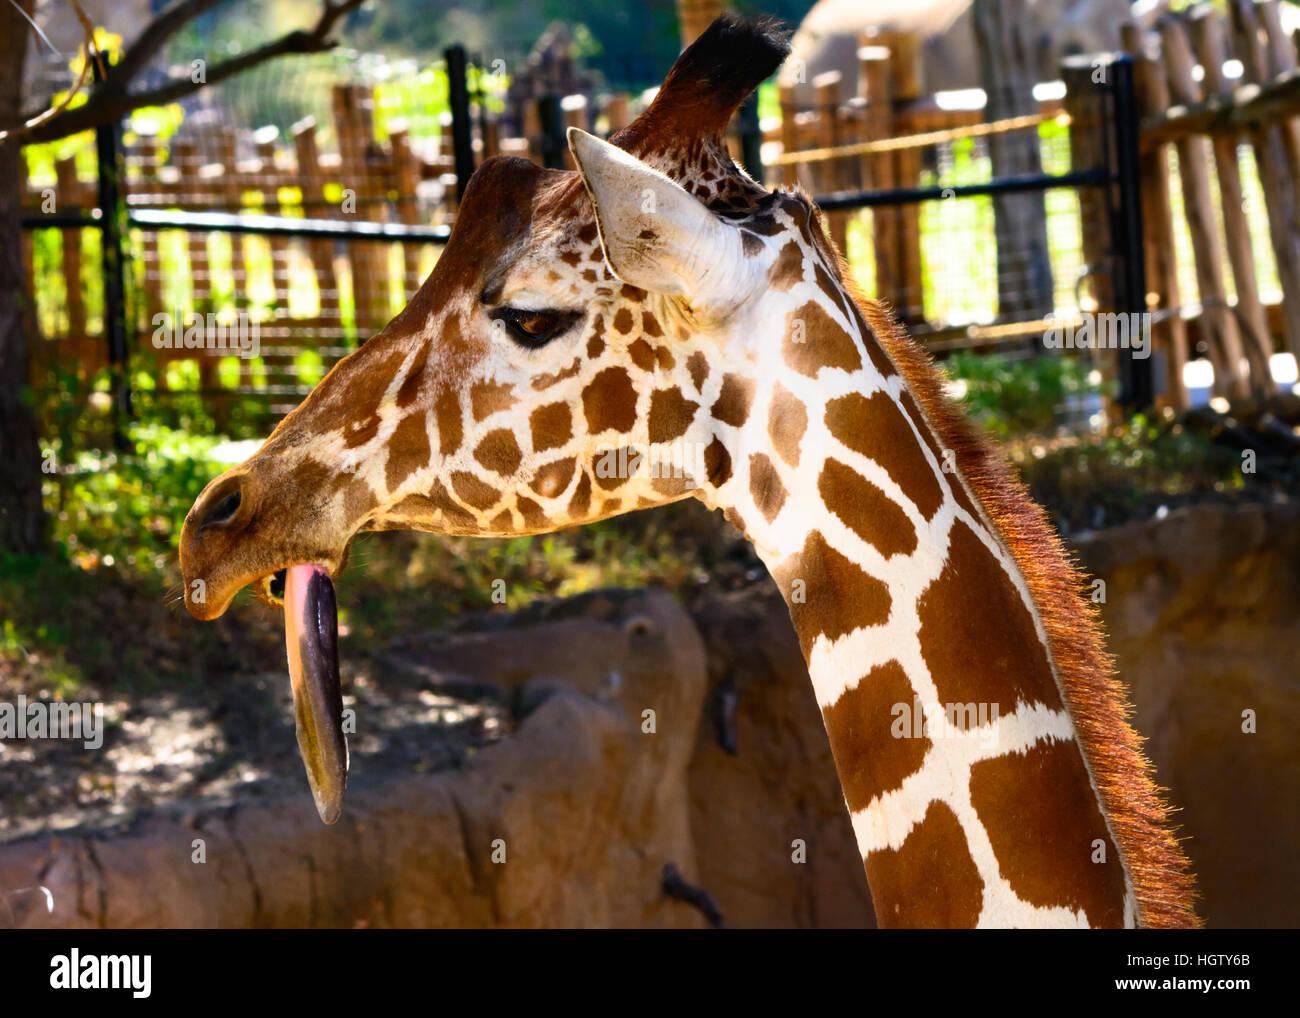 giraffe (Giraffa) with long tongue hanging down, close-up, comical, funny - Stock Image